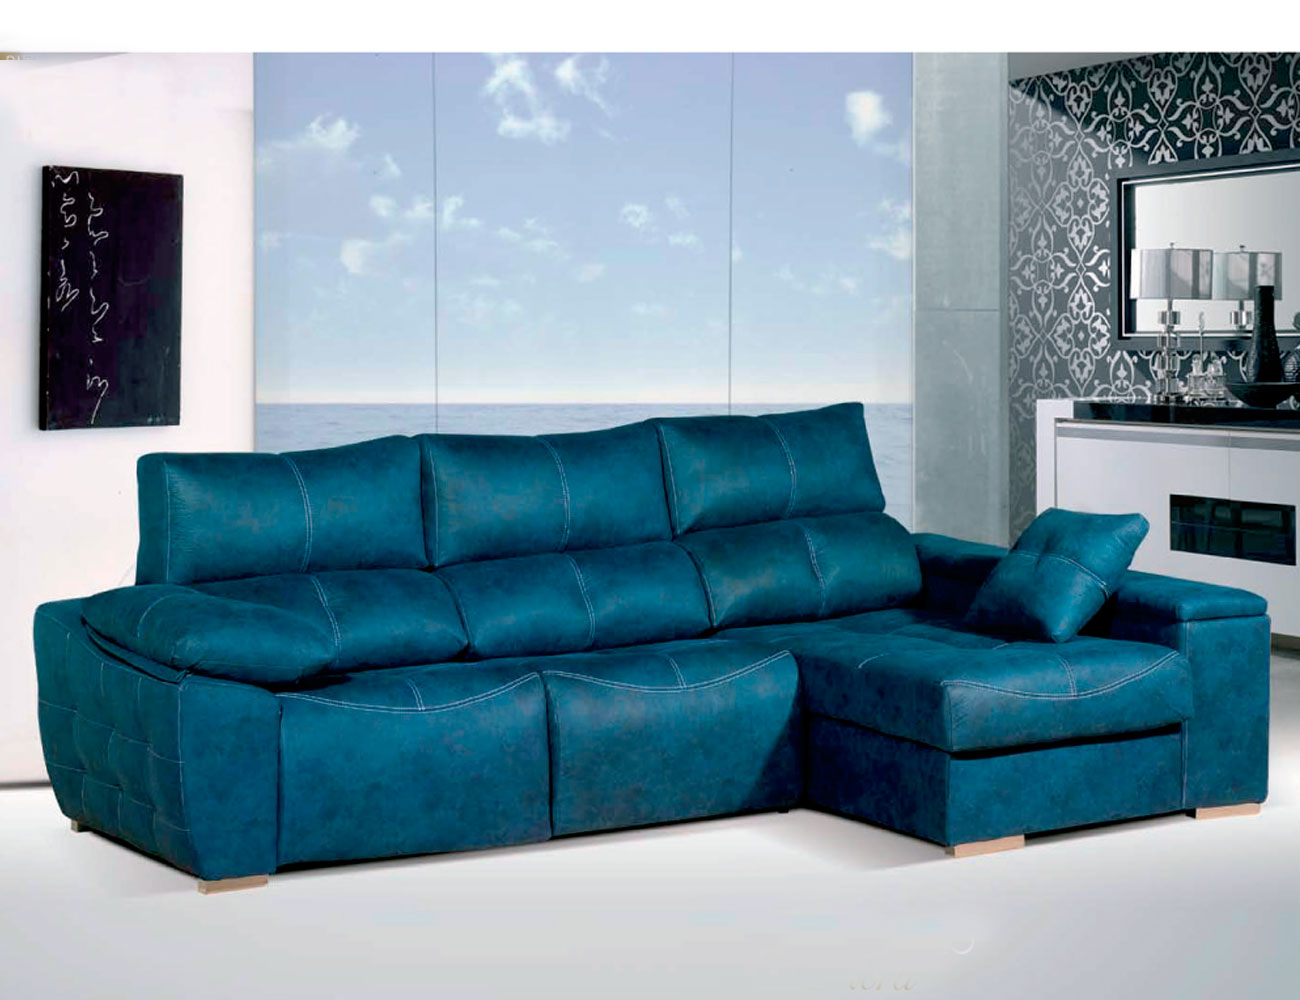 Sofa chaiselongue relax 2 motores anti manchas turquesa48